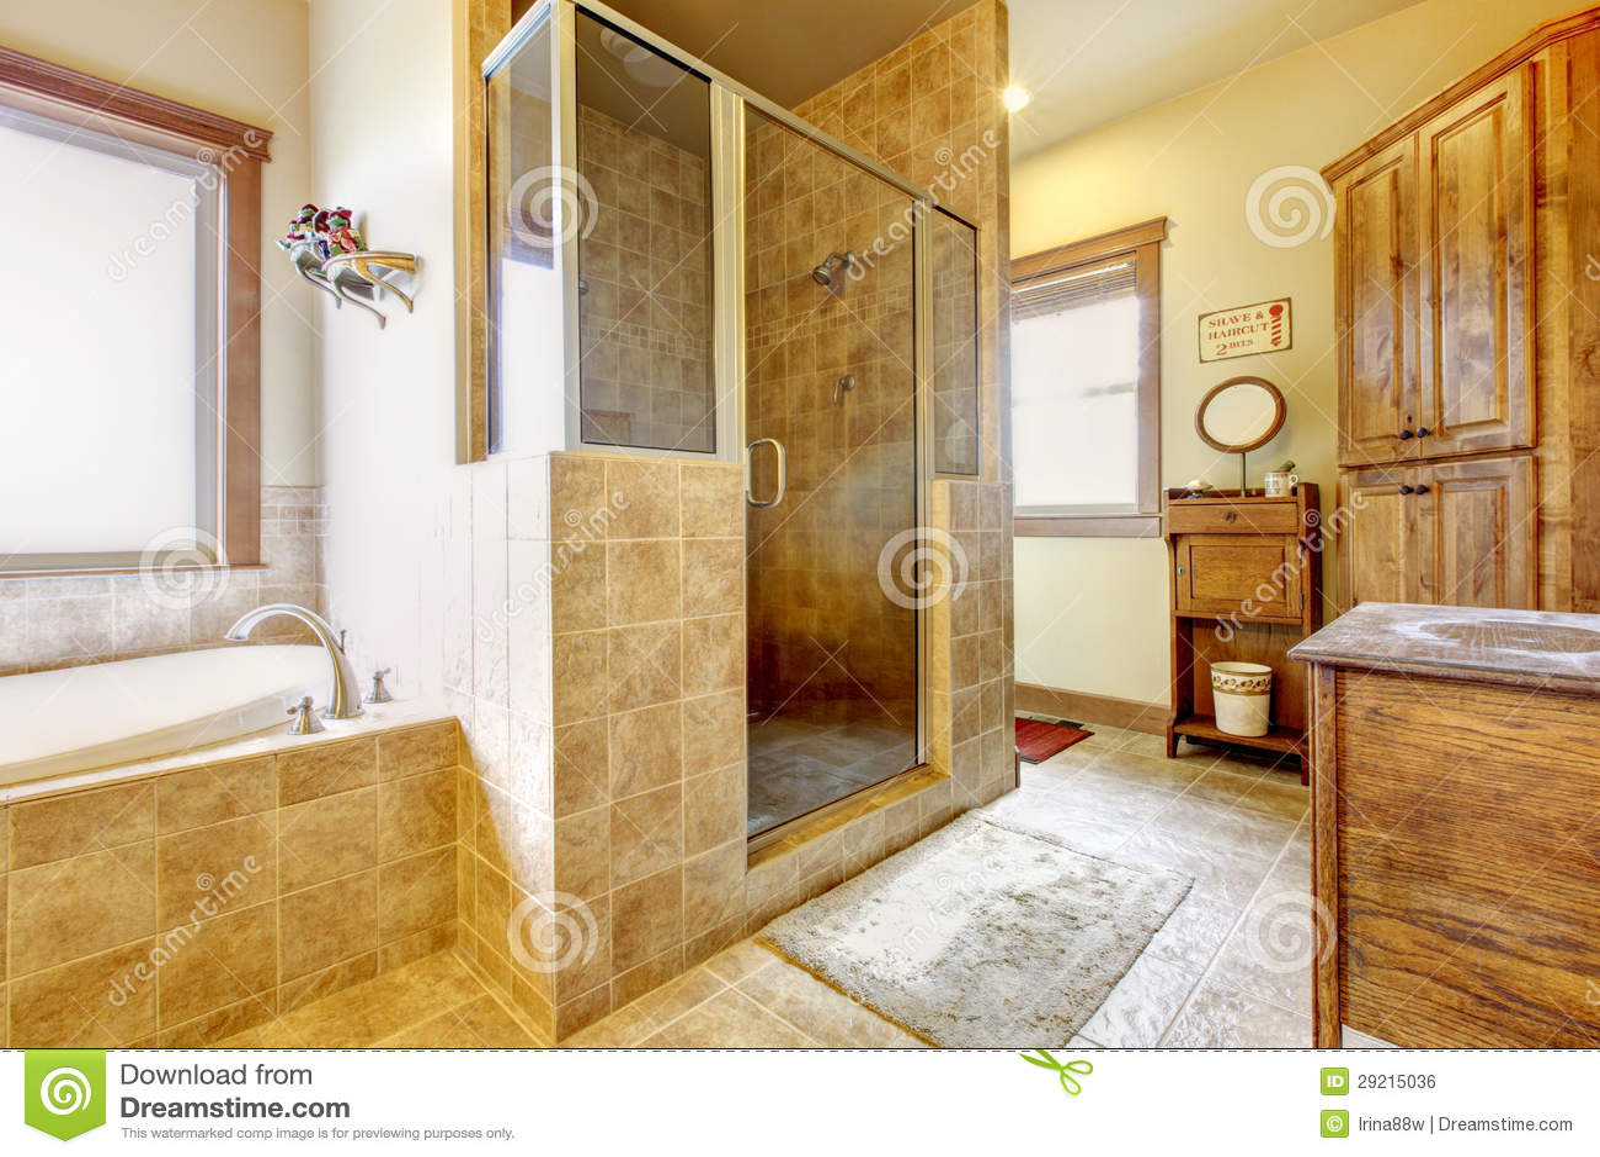 badkamer feng shui badkamer feng shui grote badkamers met houten, Meubels Ideeën